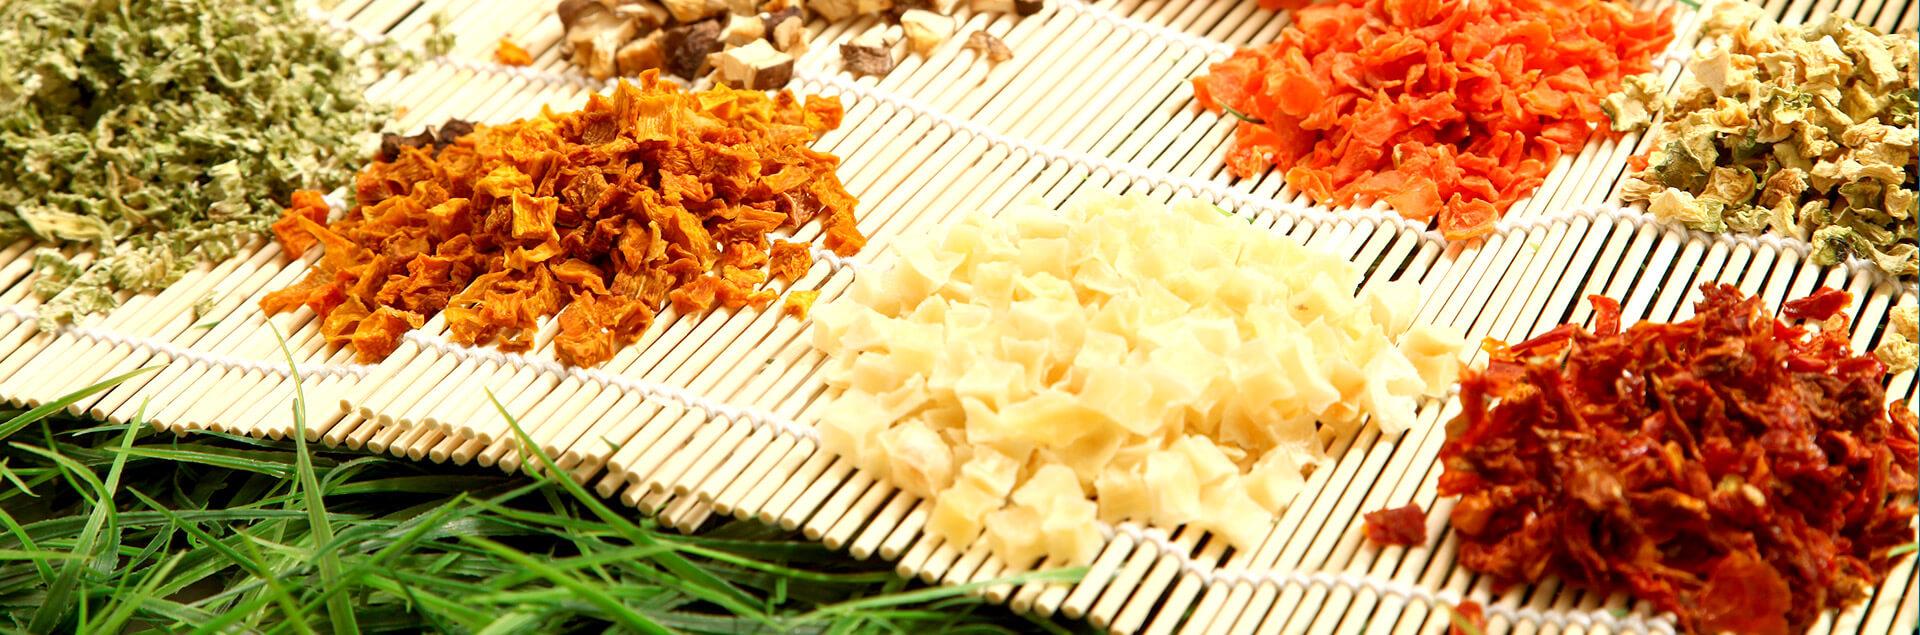 Dehydrated vegetables from Xinghua Lianfu Food